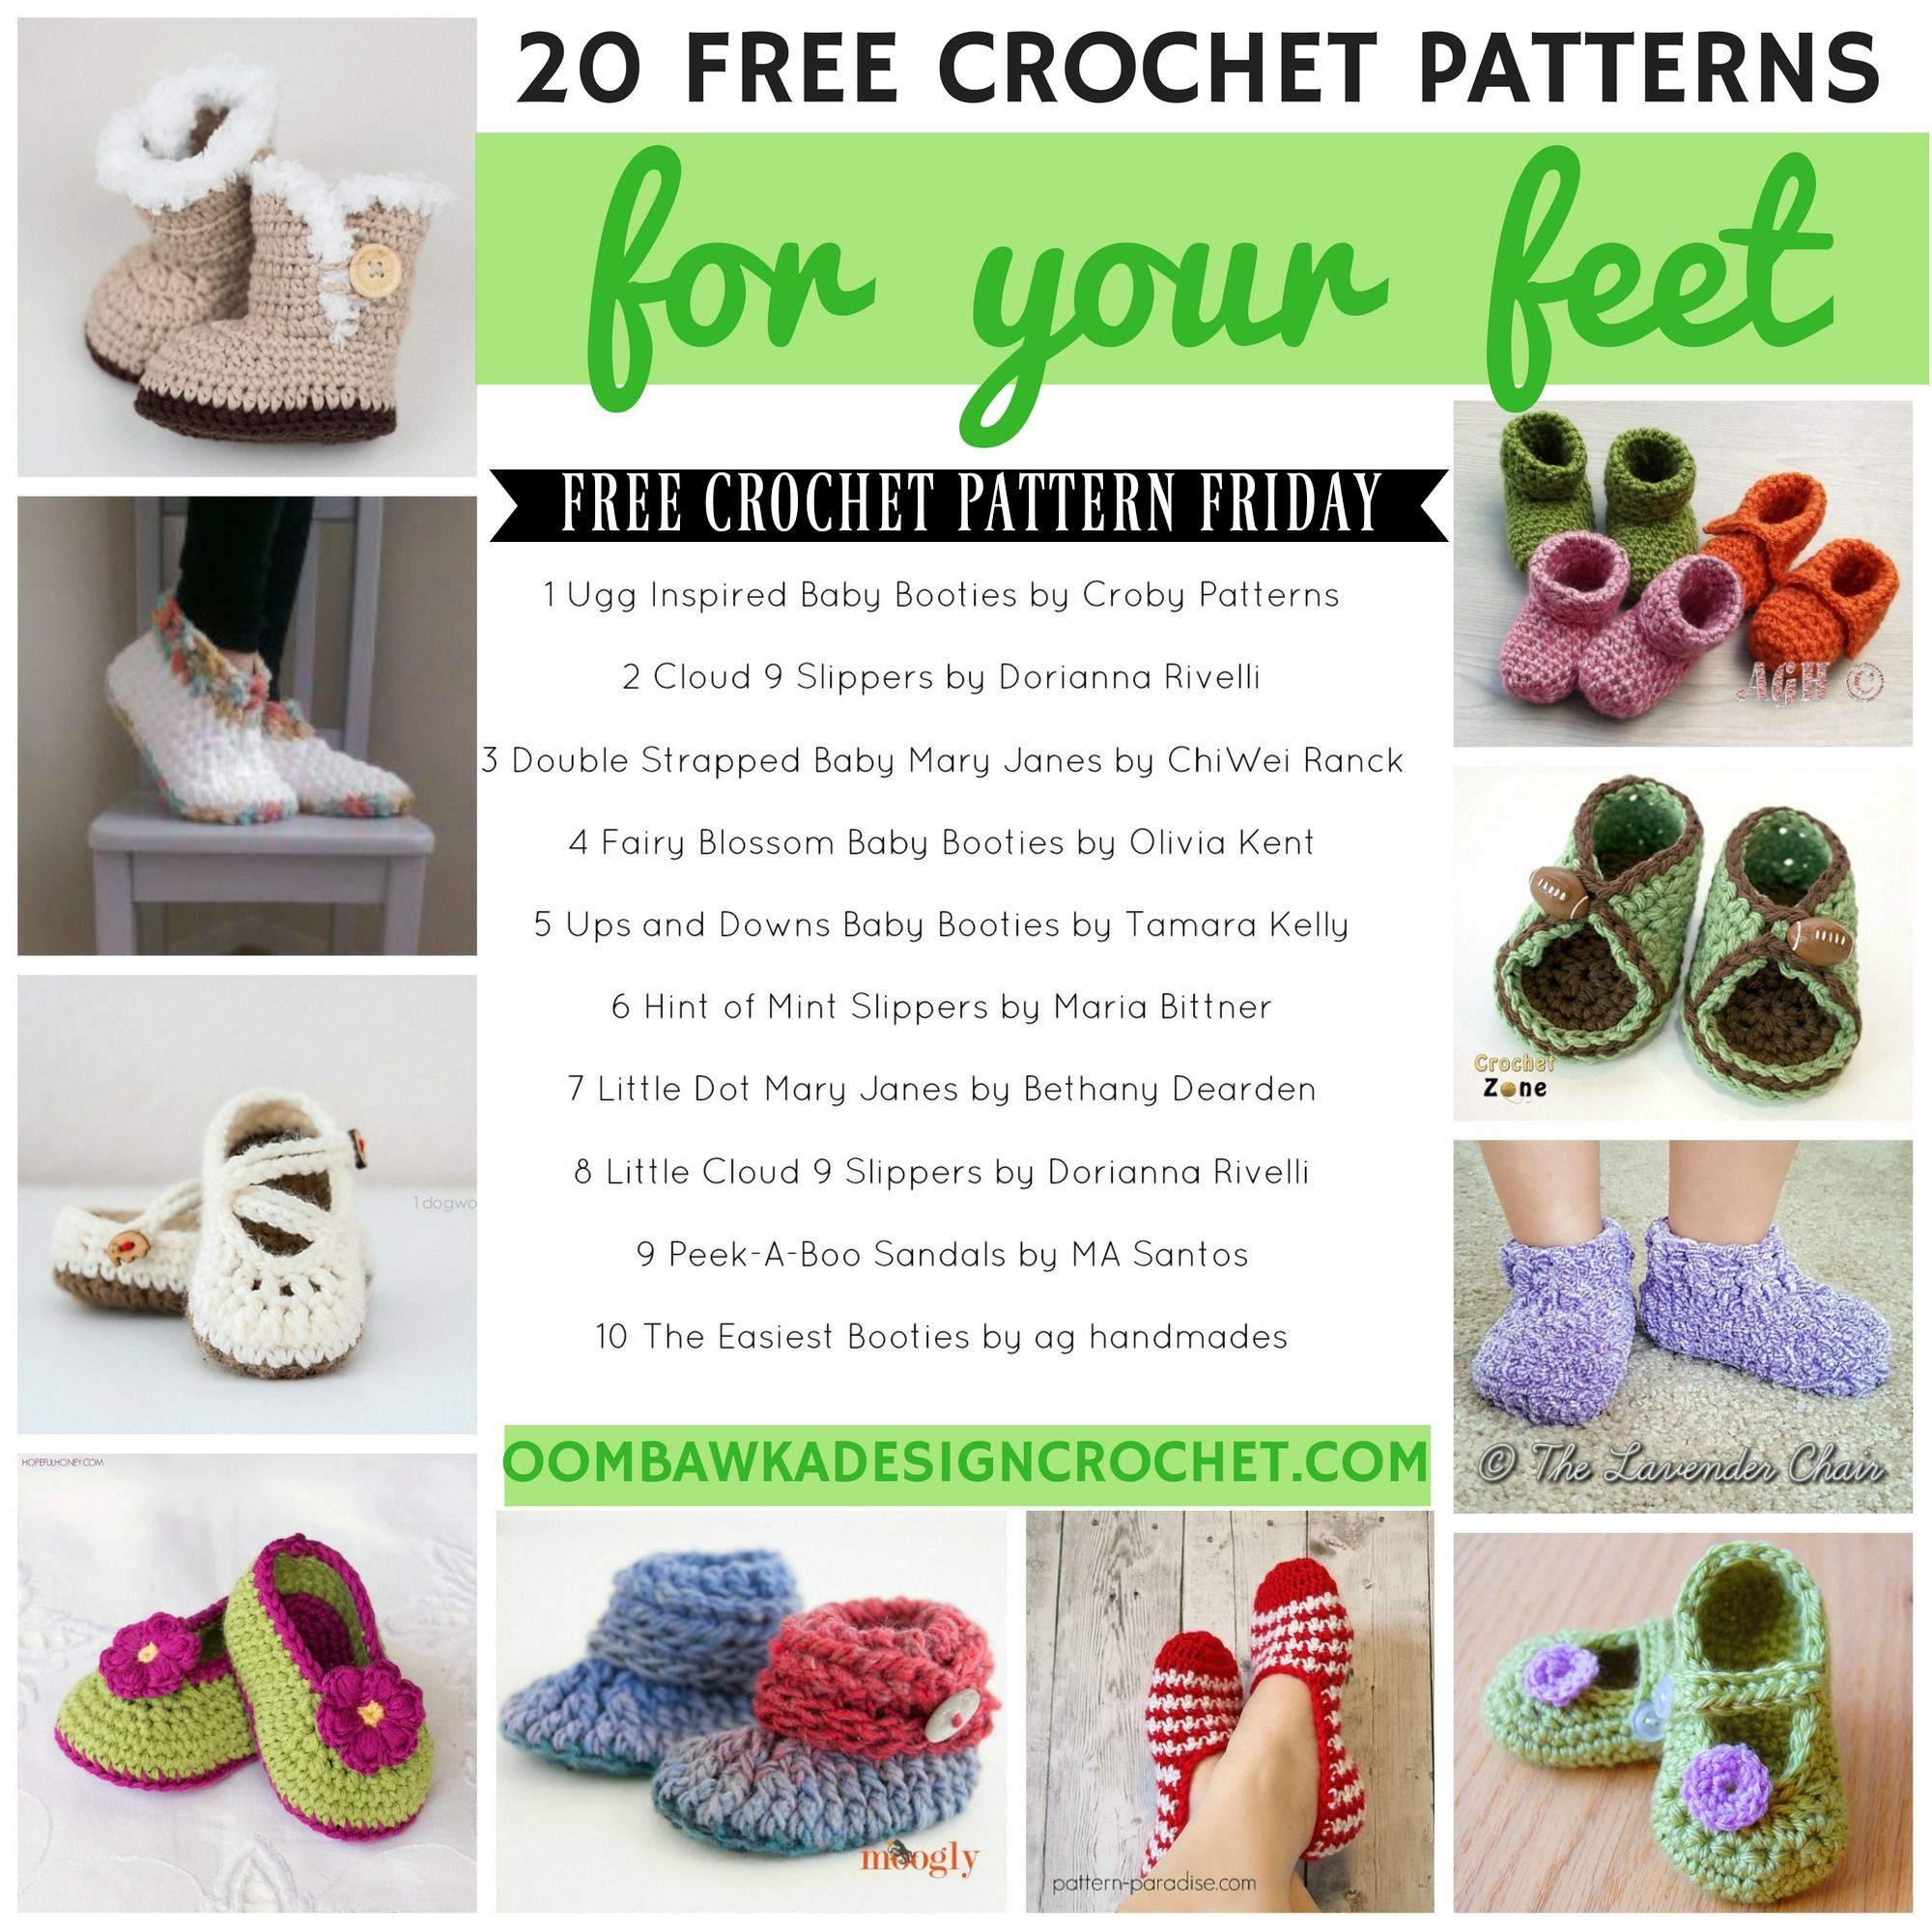 20 FREE Crochet Patterns for Your Feet | patrones gratis | Pinterest ...